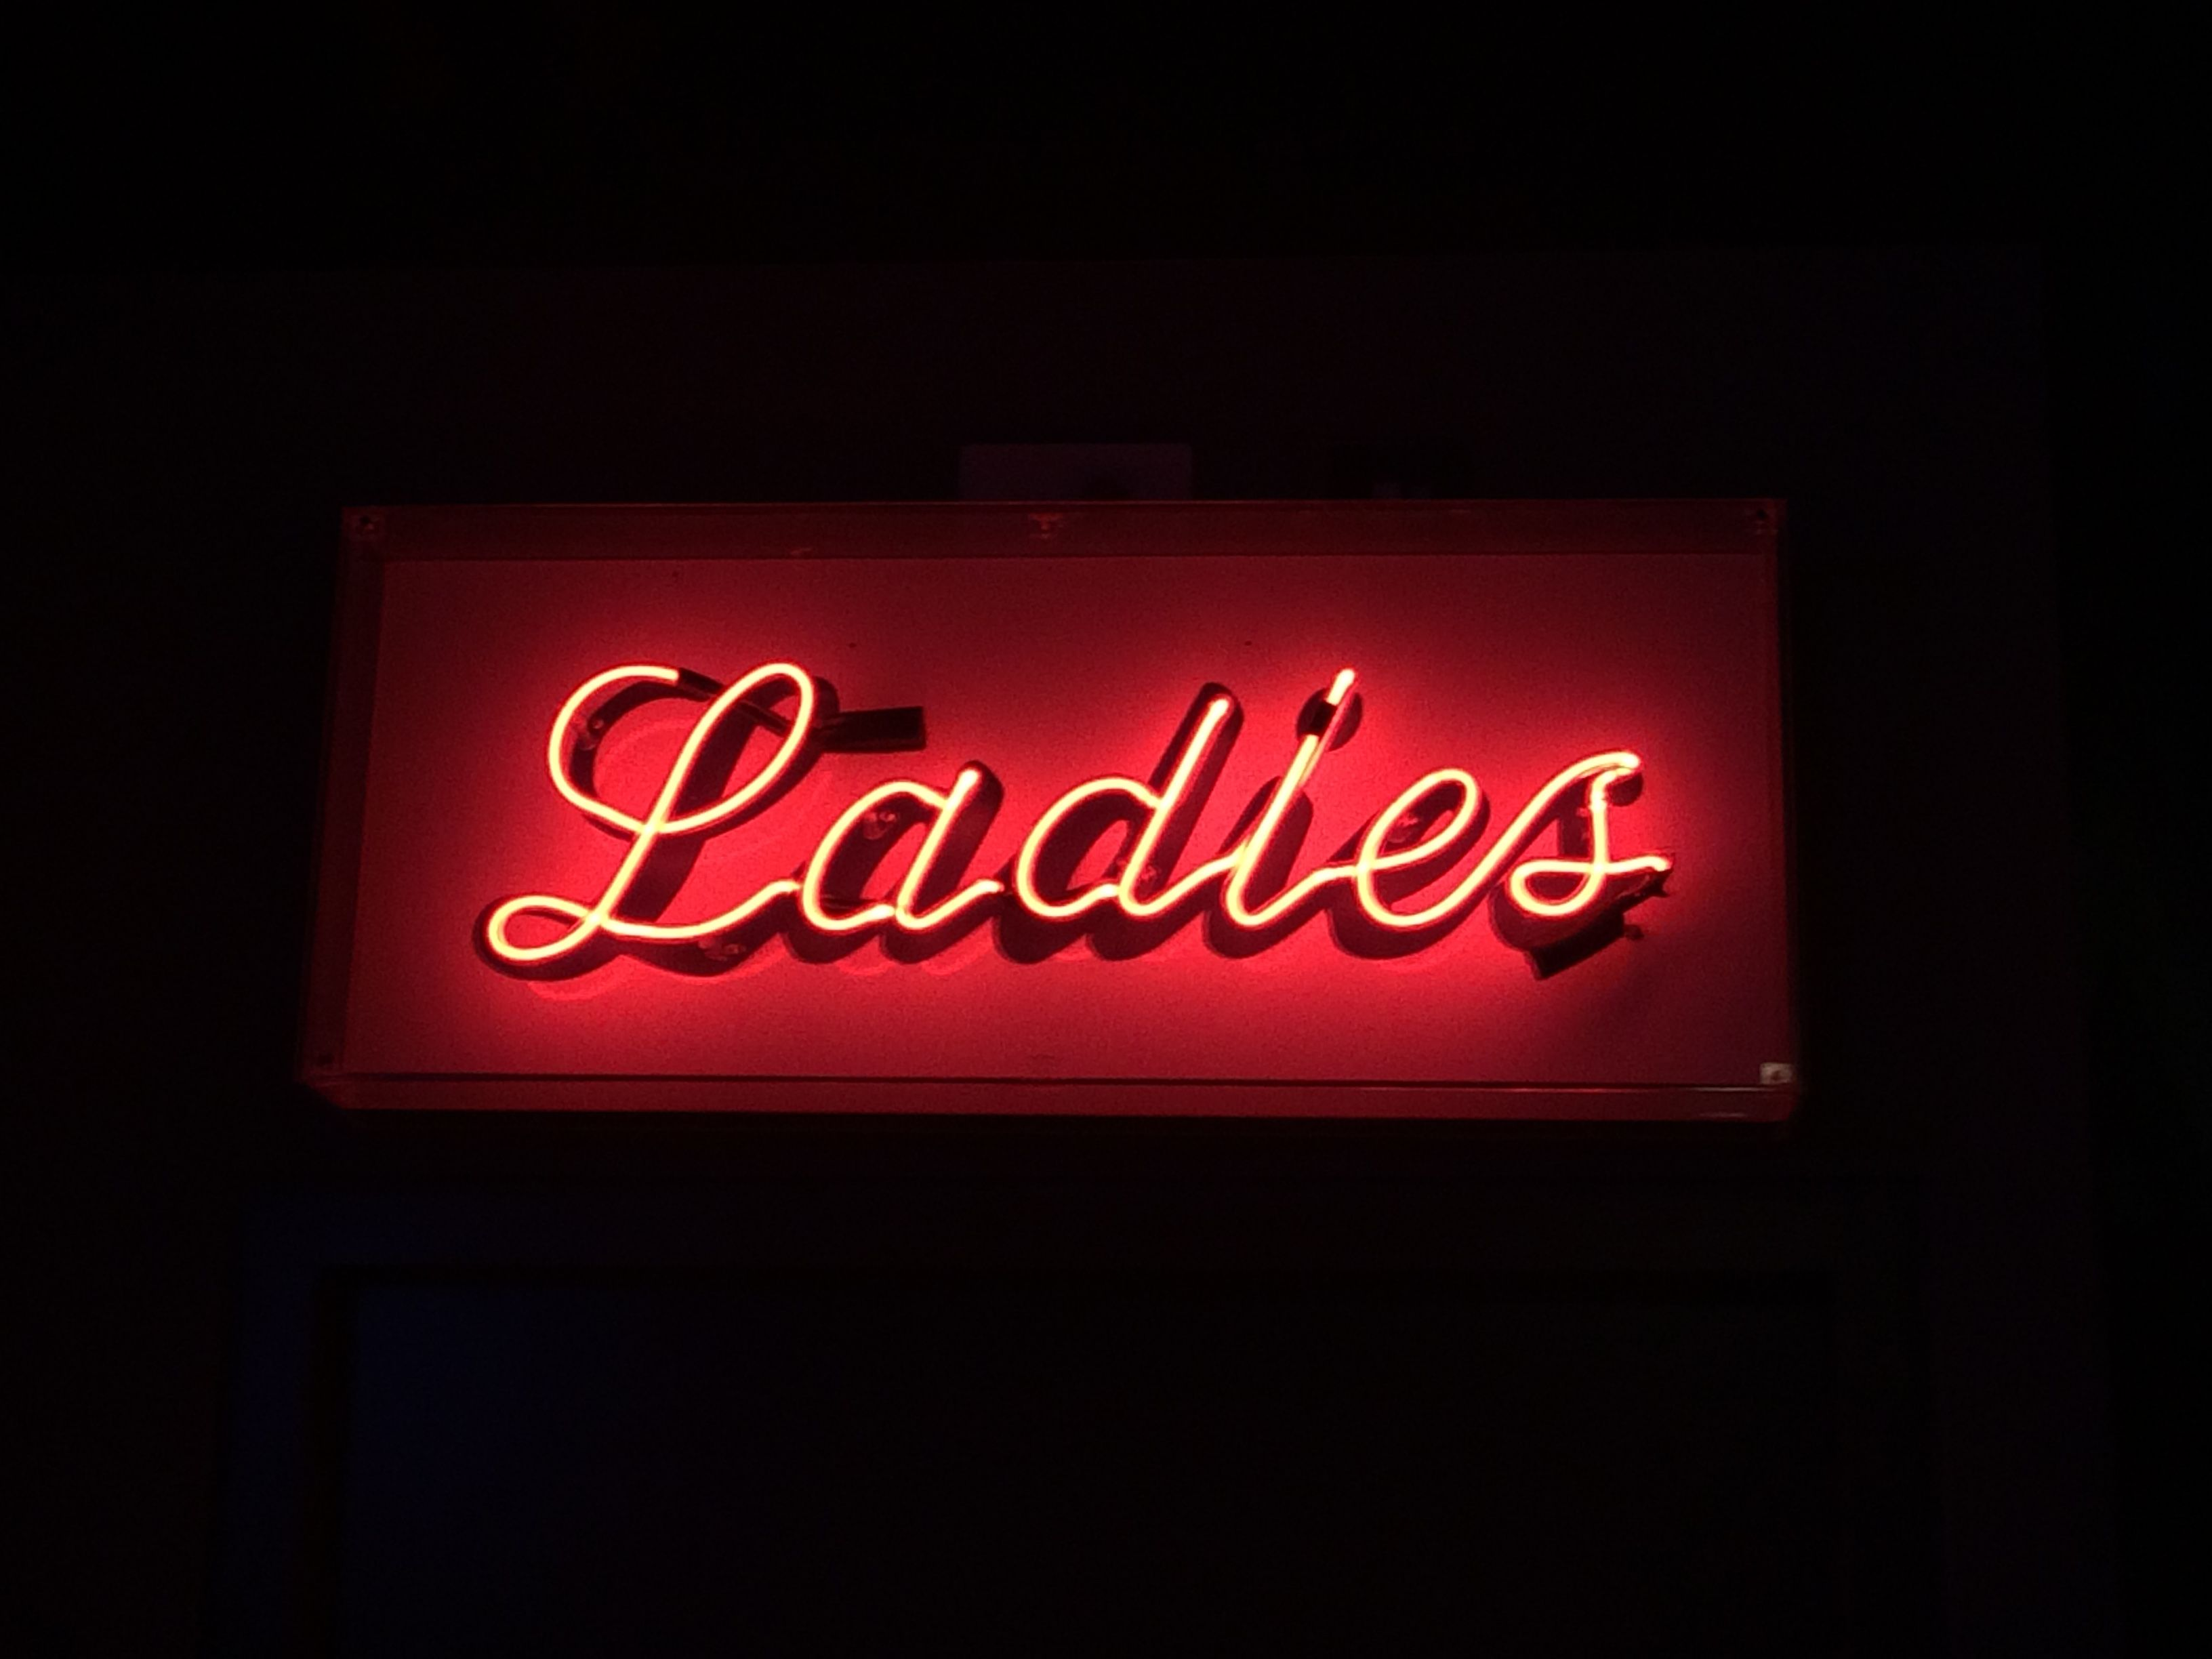 Aesthetic Neon Red Ladies Sign Neon Eikones